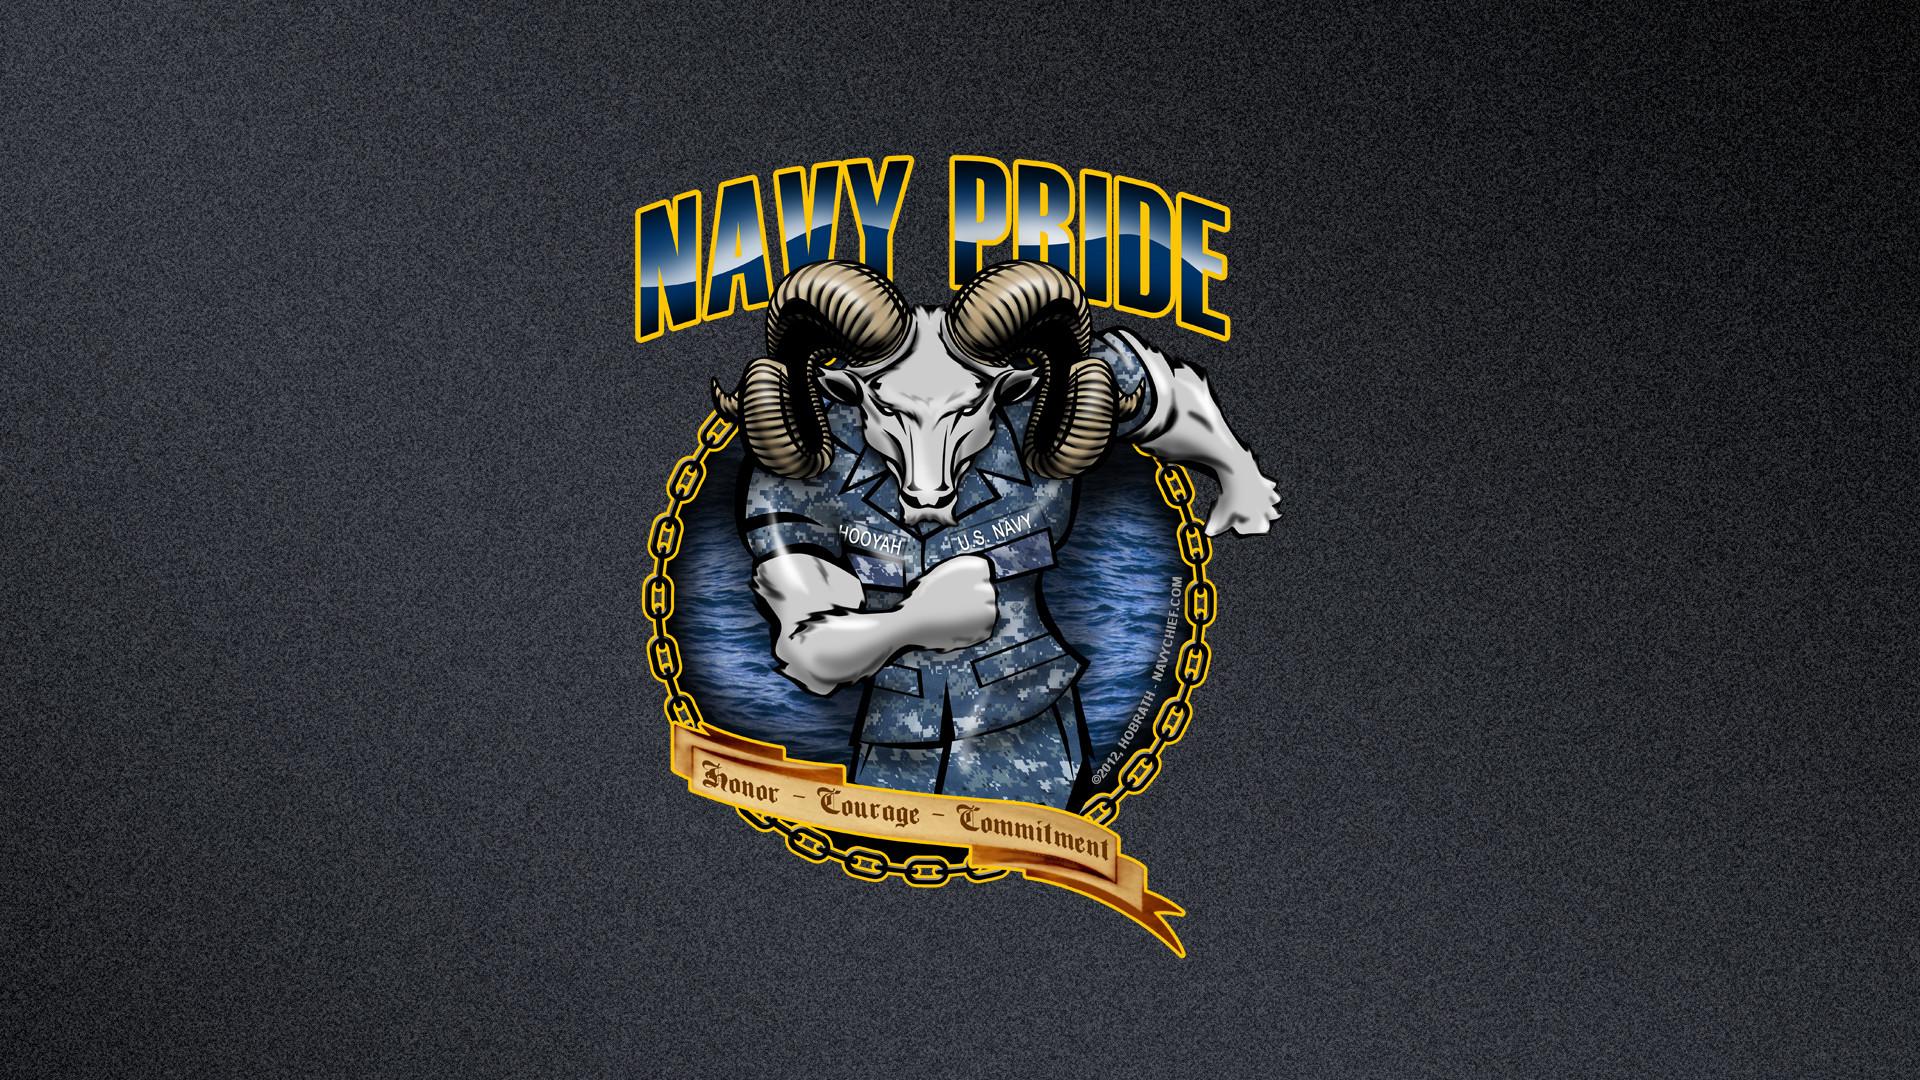 Res: 1920x1080, Top 500 screensaver: Naval screensaver